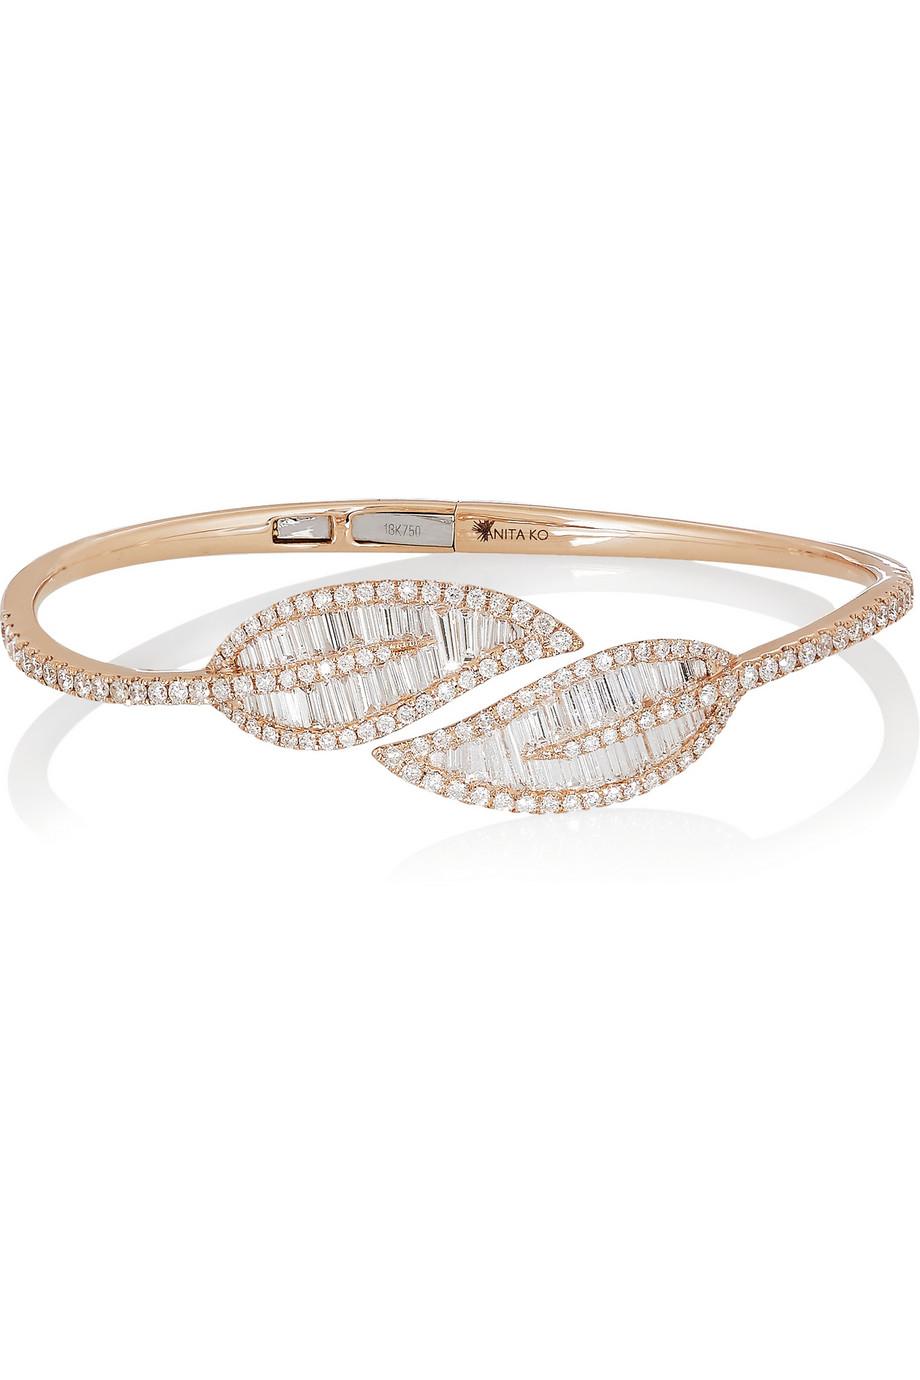 Anita Ko Eternity 18-karat White Gold Diamond Bracelet IyiaSOJR6